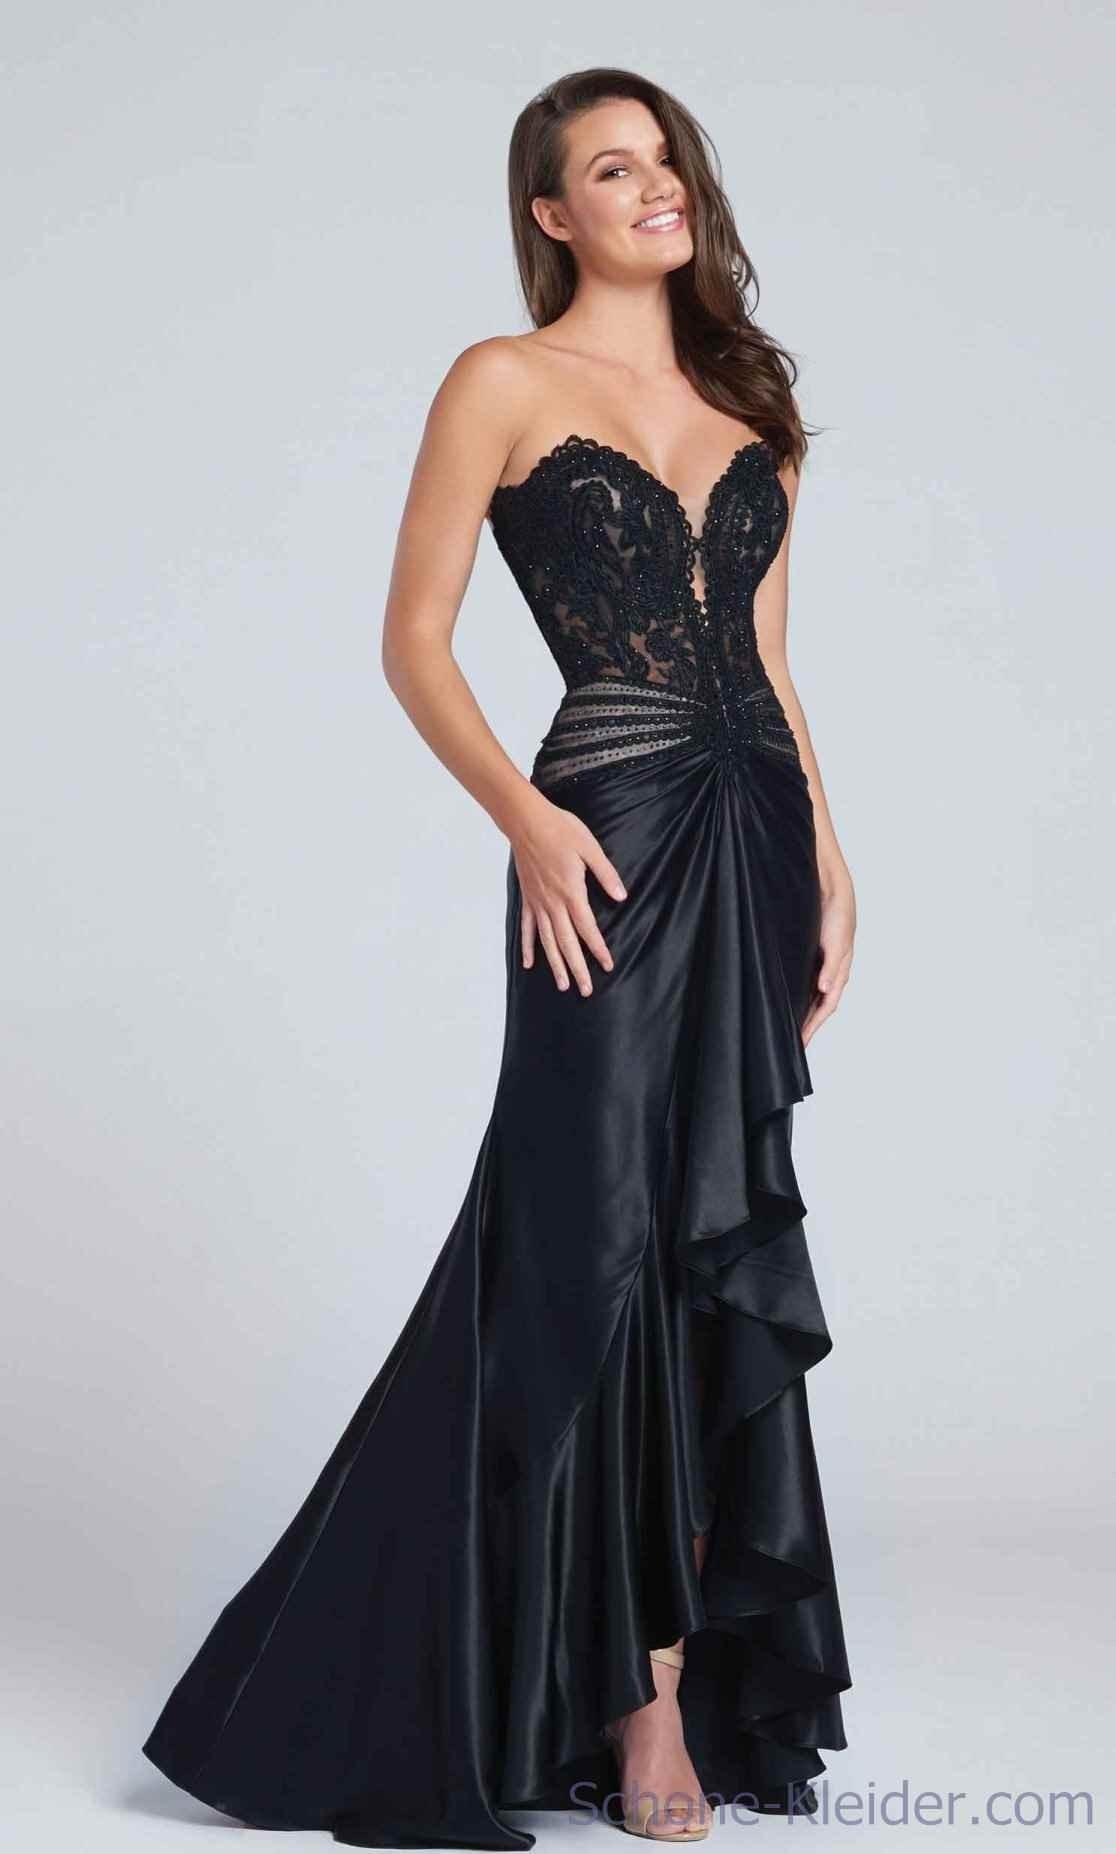 10 Cool Schwarzes Abendkleid Lang Spitze Ärmel17 Erstaunlich Schwarzes Abendkleid Lang Spitze Spezialgebiet